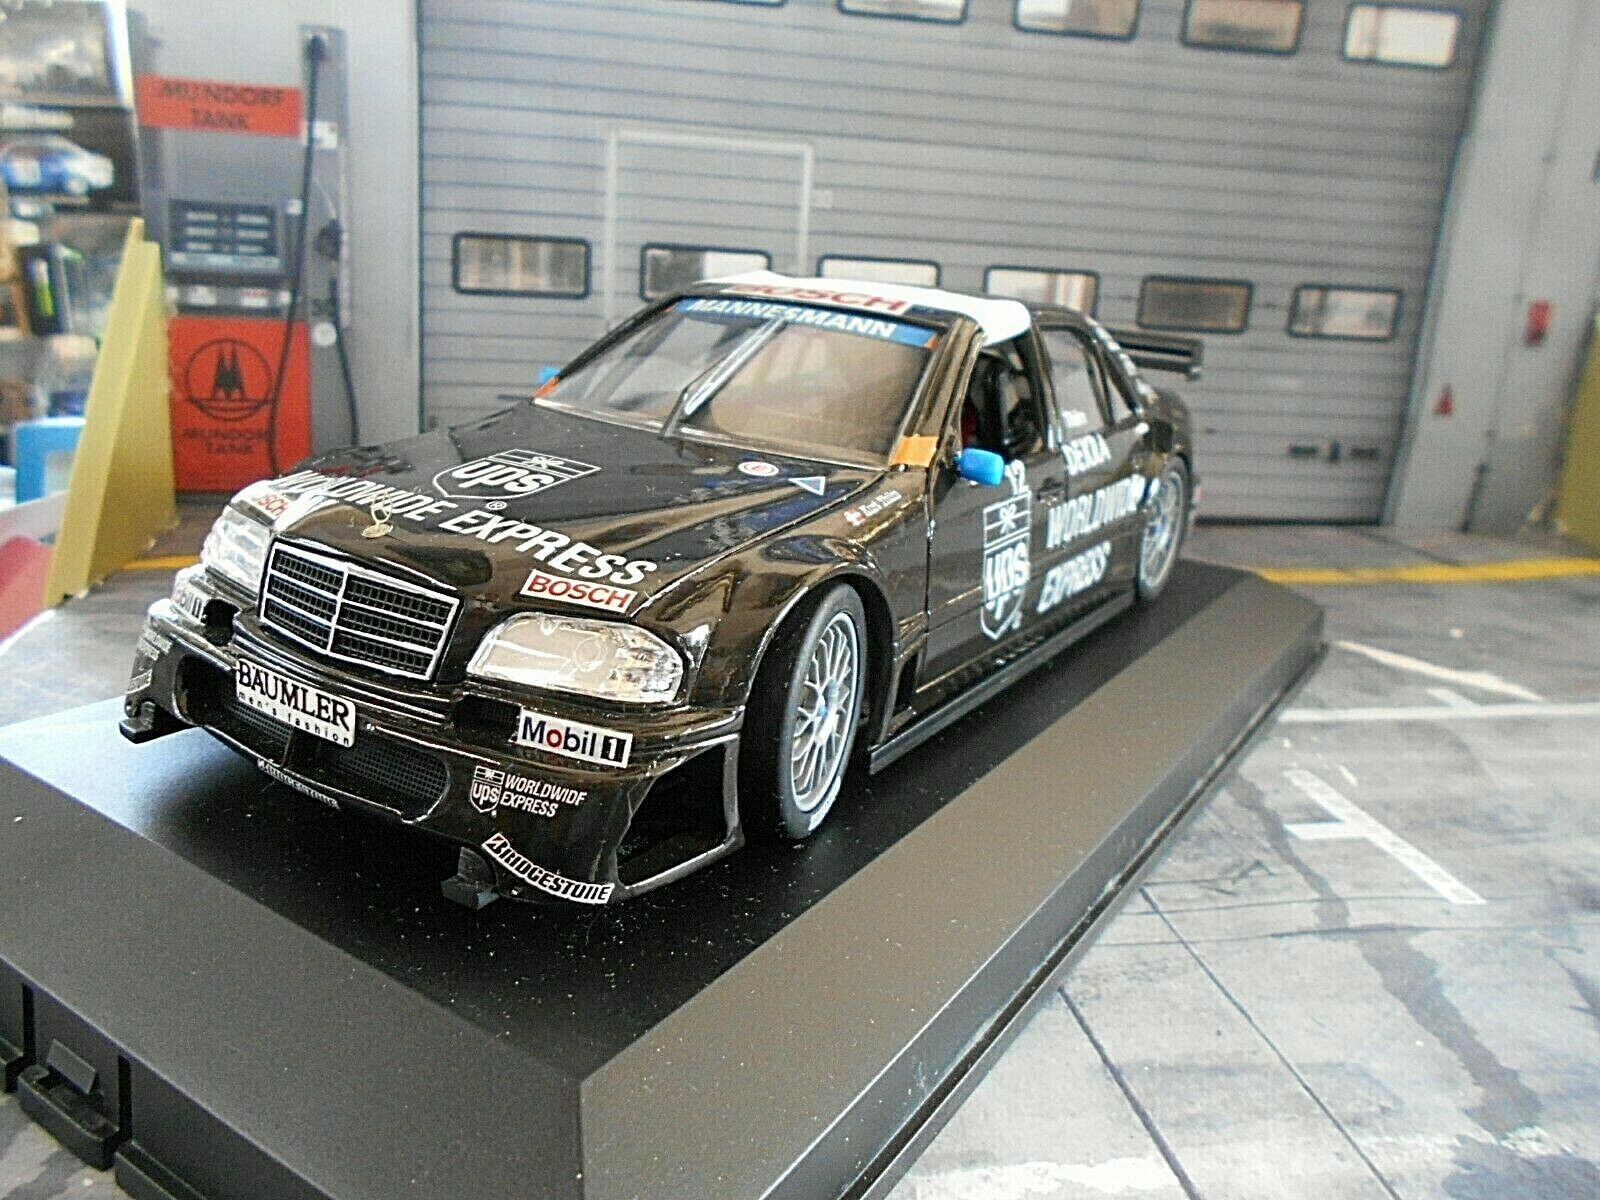 Mercedes Benz C Class AMG DTM ITC 1996 THIIM UPS UT Exclusive Cars 1 18